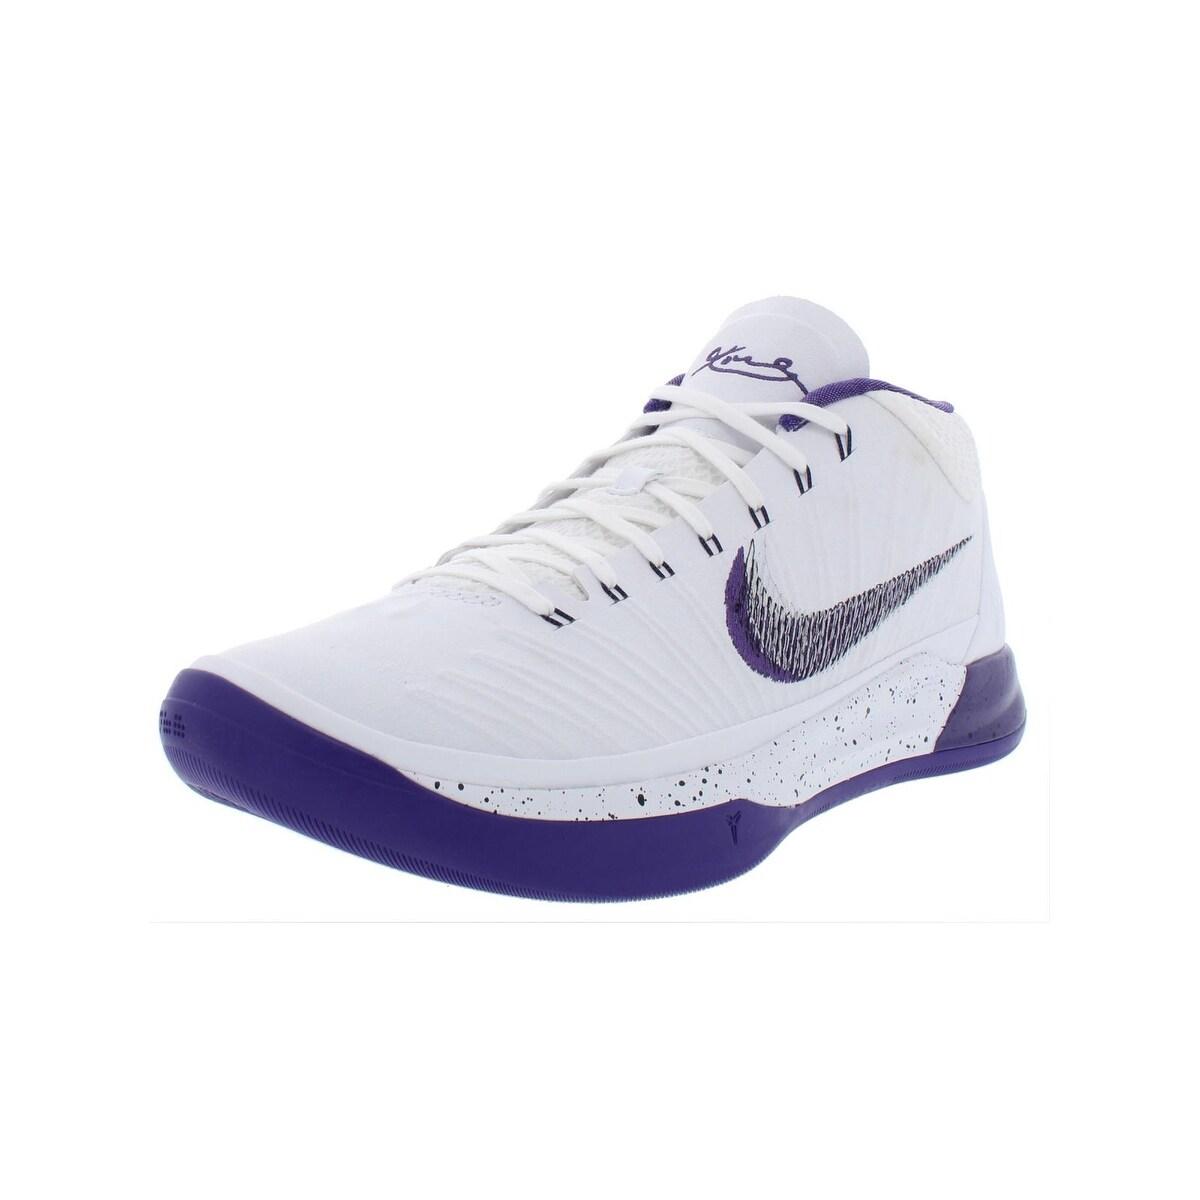 c341880f7ef9 Size 11 Nike Men s Shoes